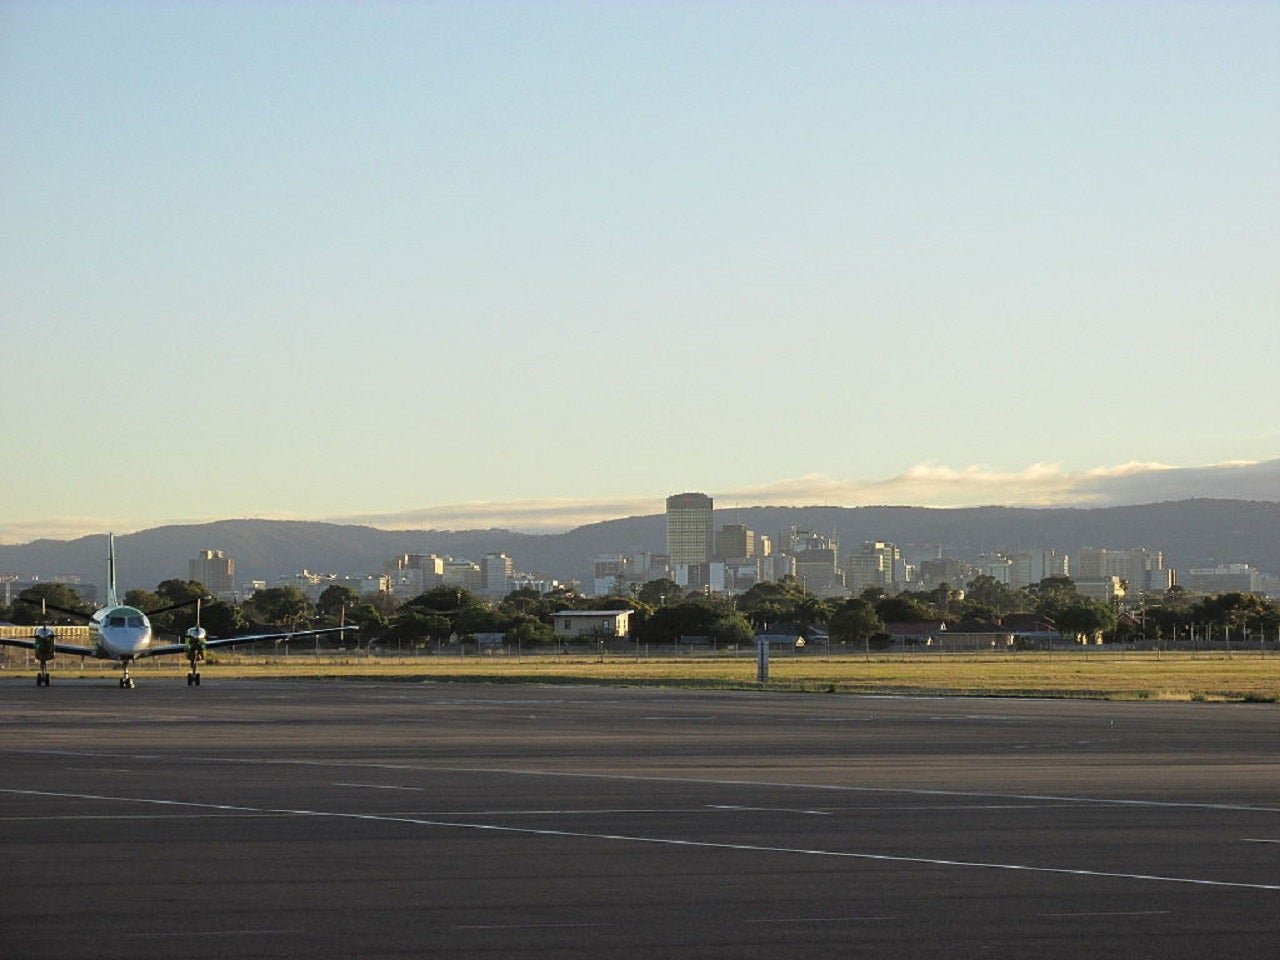 Adelaide Airport in Australia unveils new international departures hall